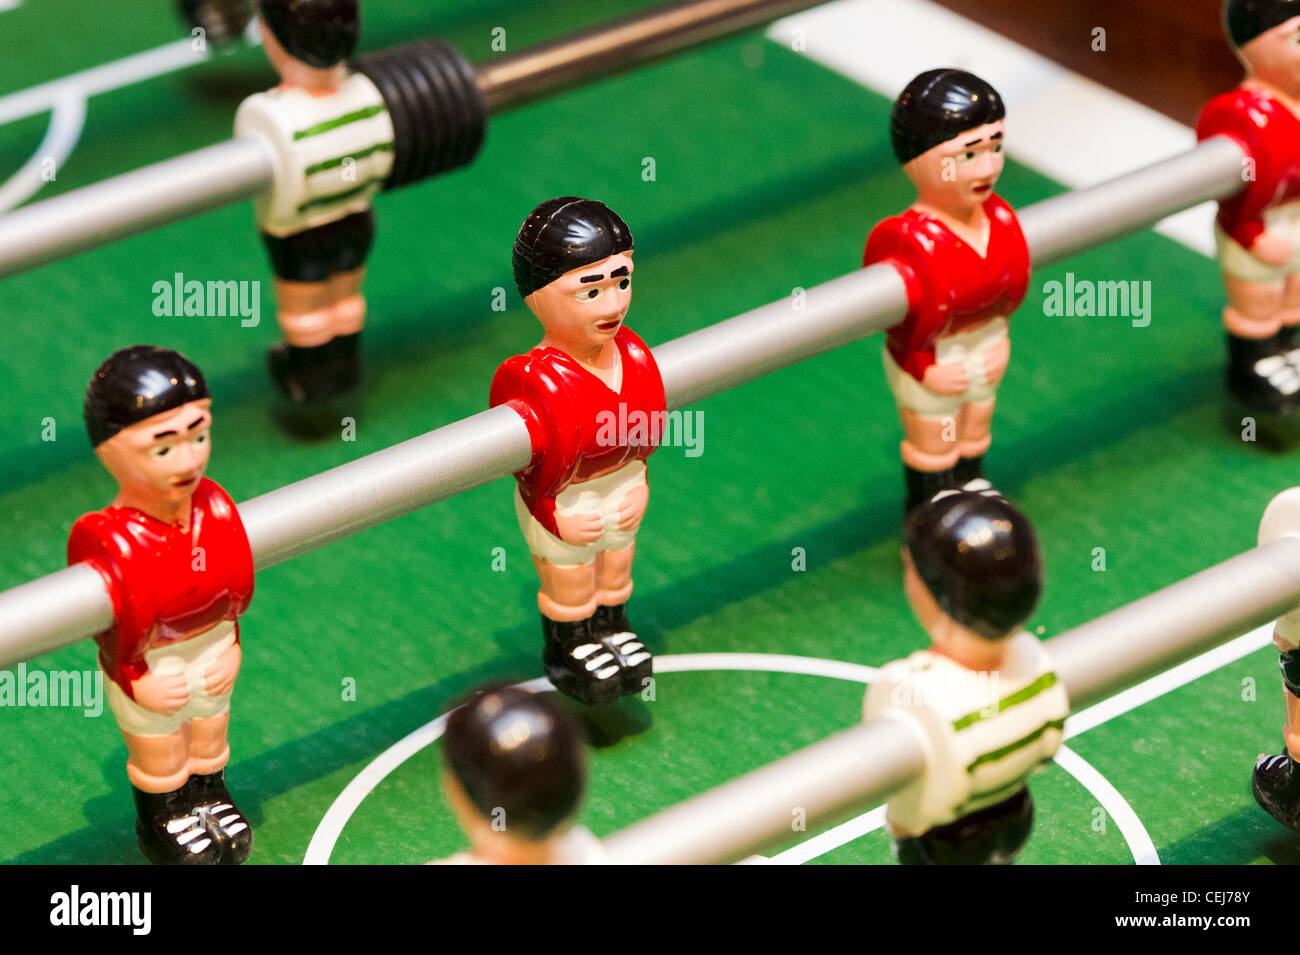 Table football players - Stock Image